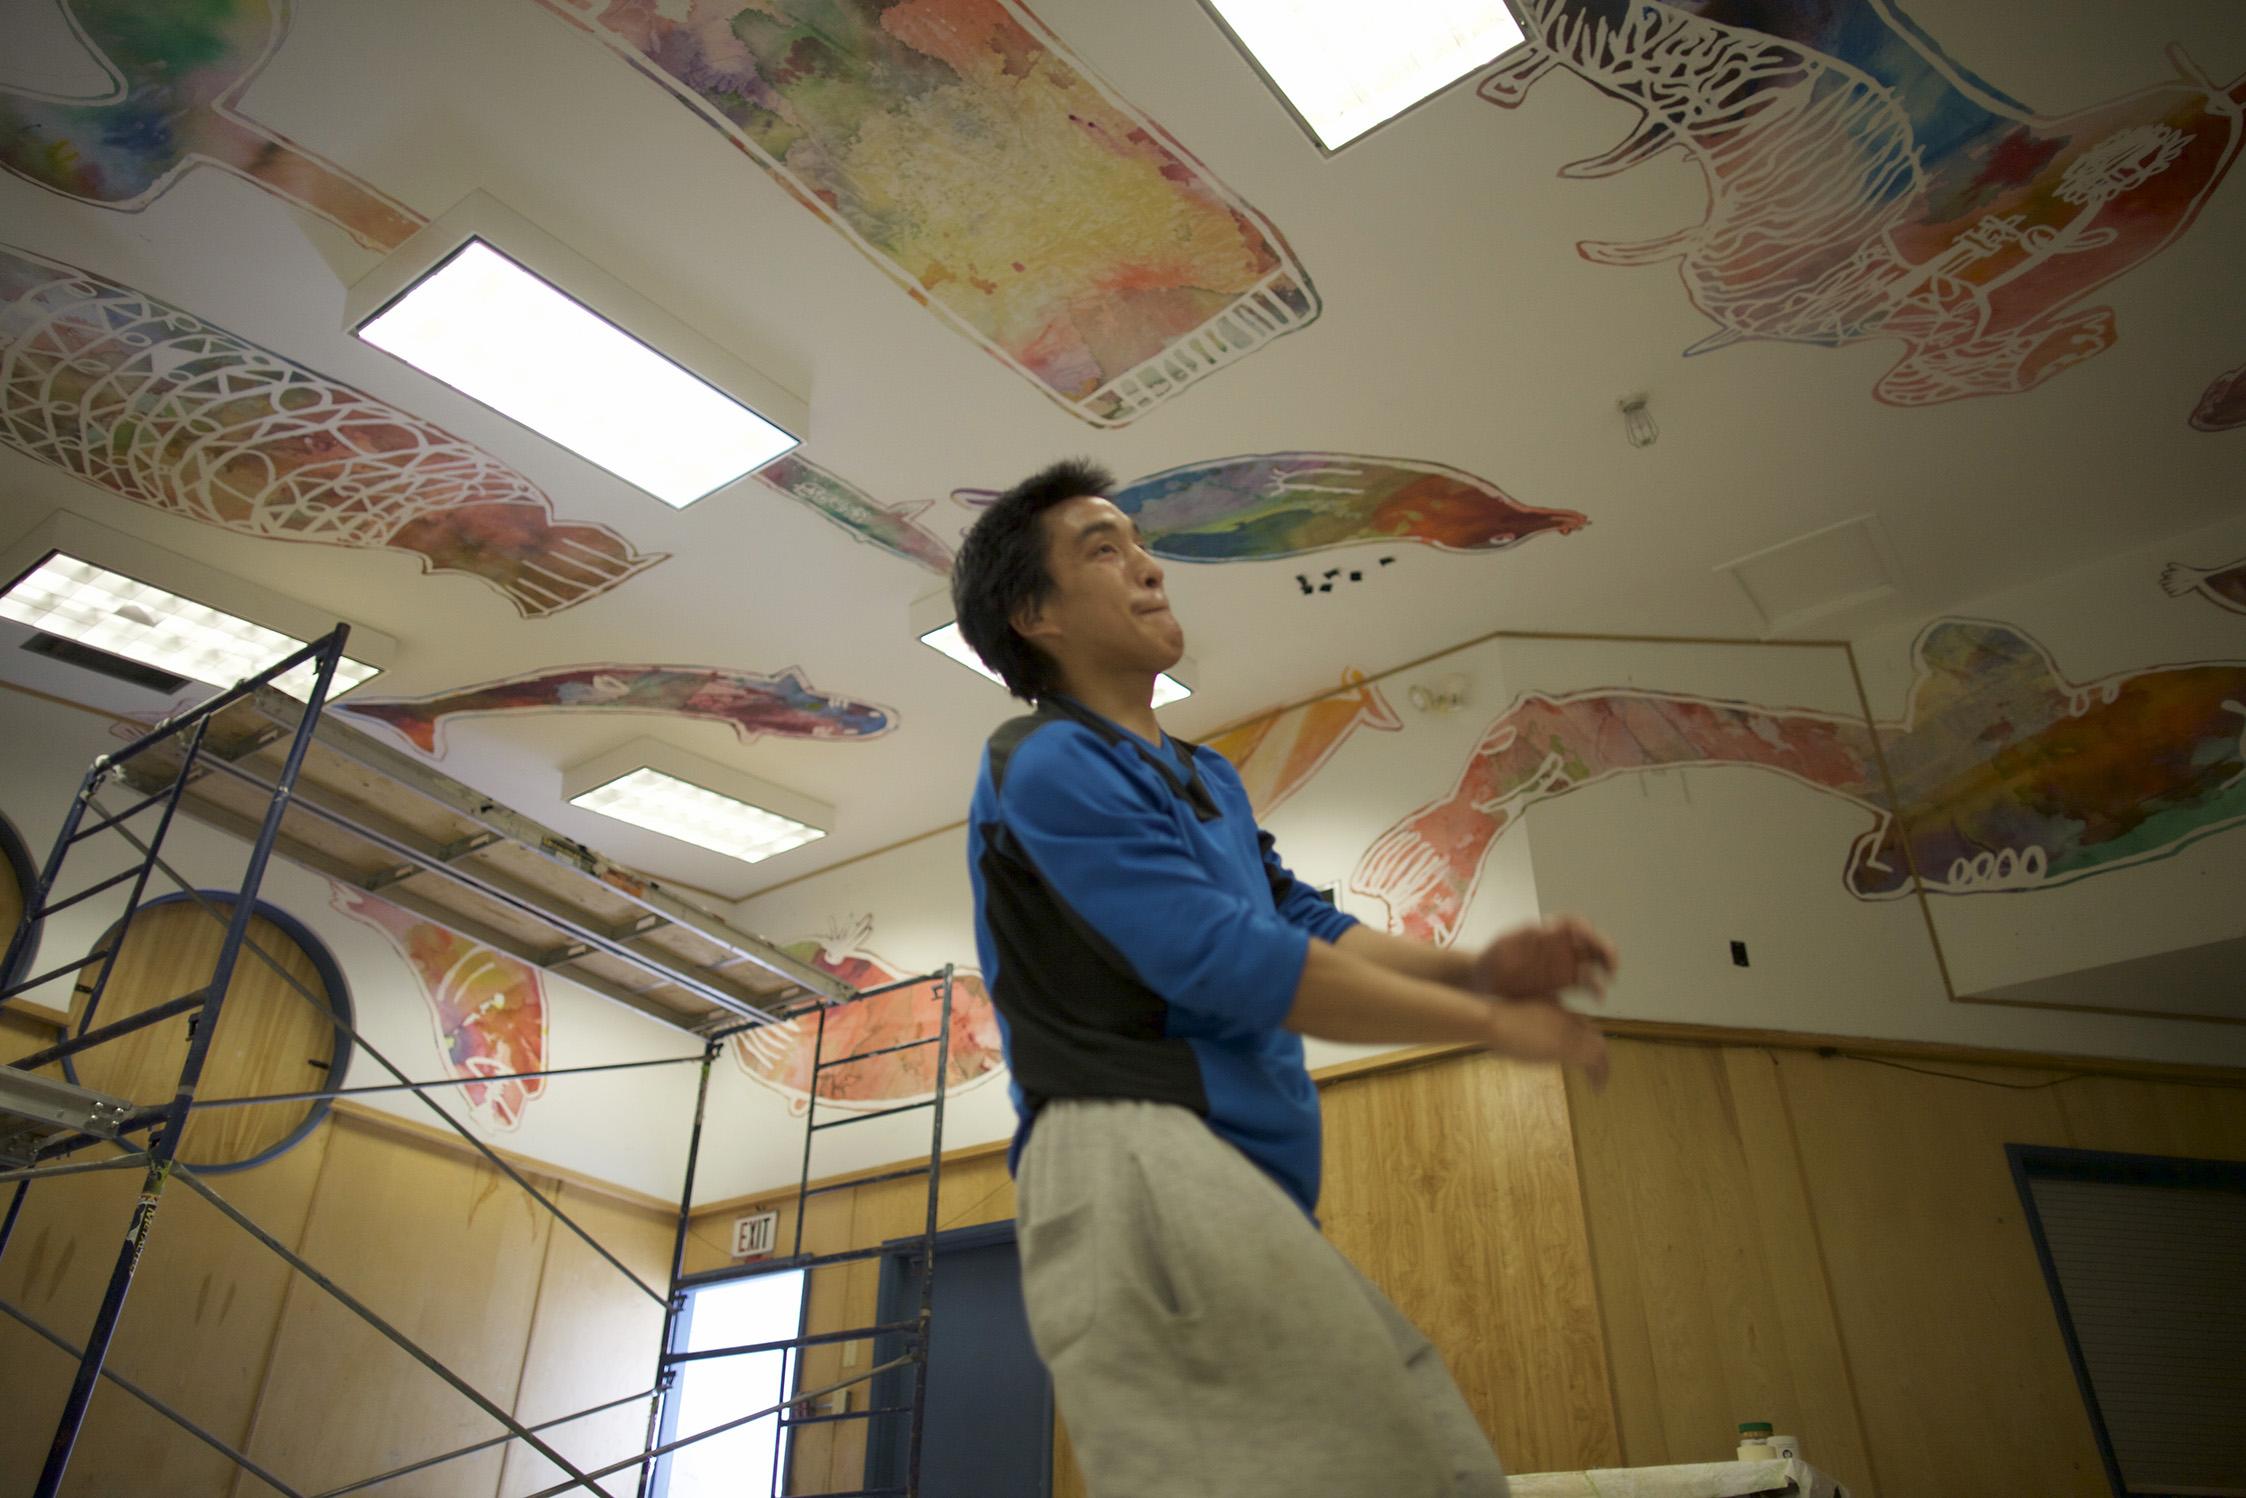 Installing the mural makes Iqaluk break into dance!